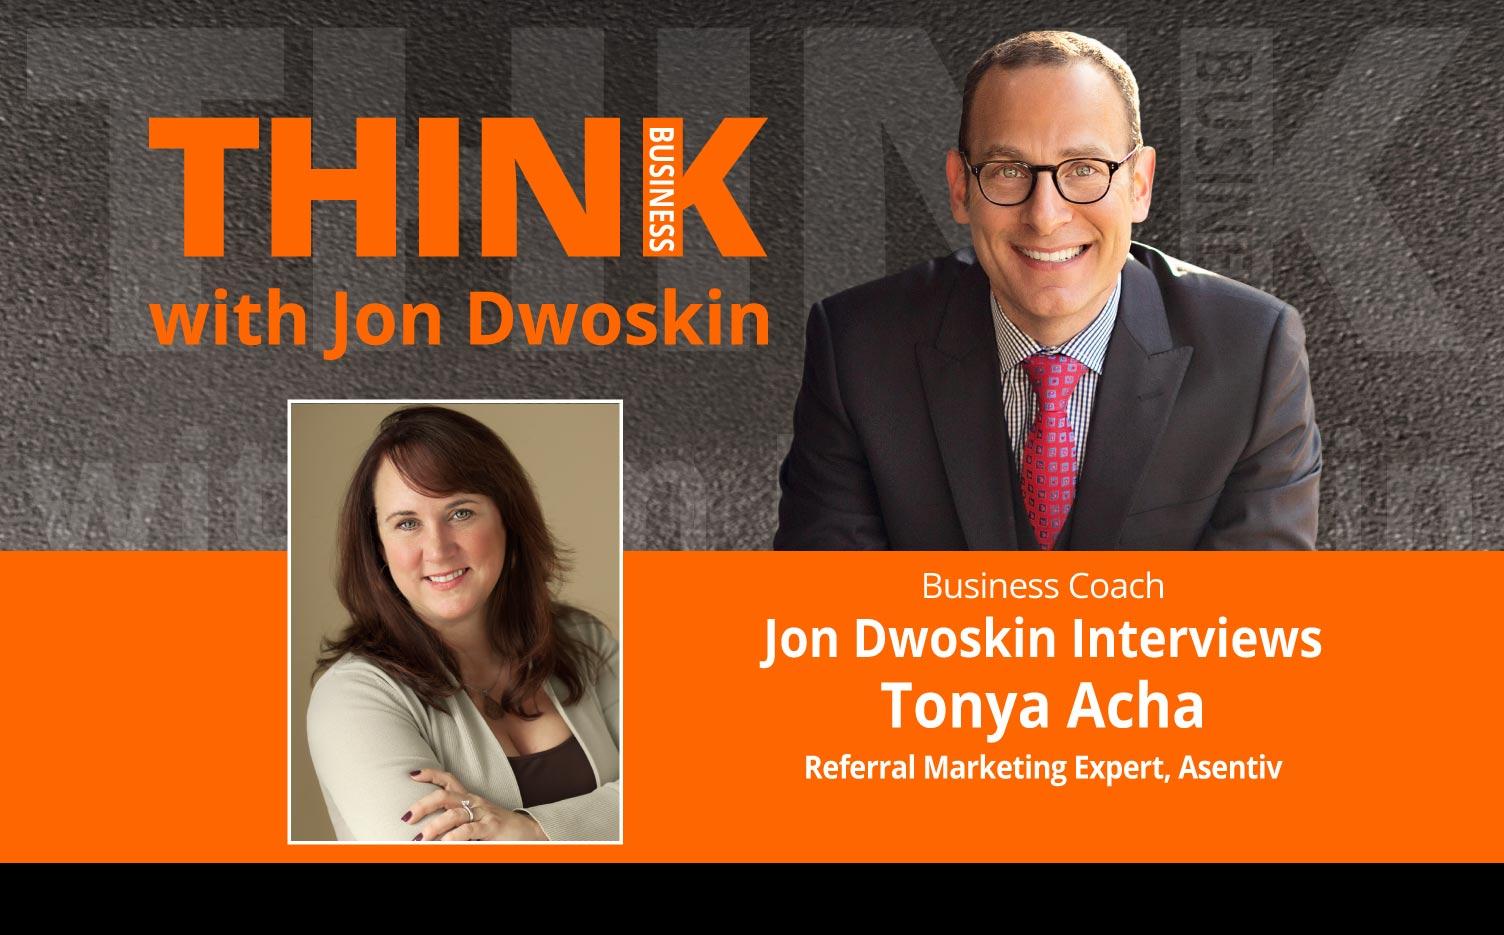 THINK Business Podcast: Jon Dwoskin Interviews Tonya Acha, Referral Marketing Expert, Asentiv